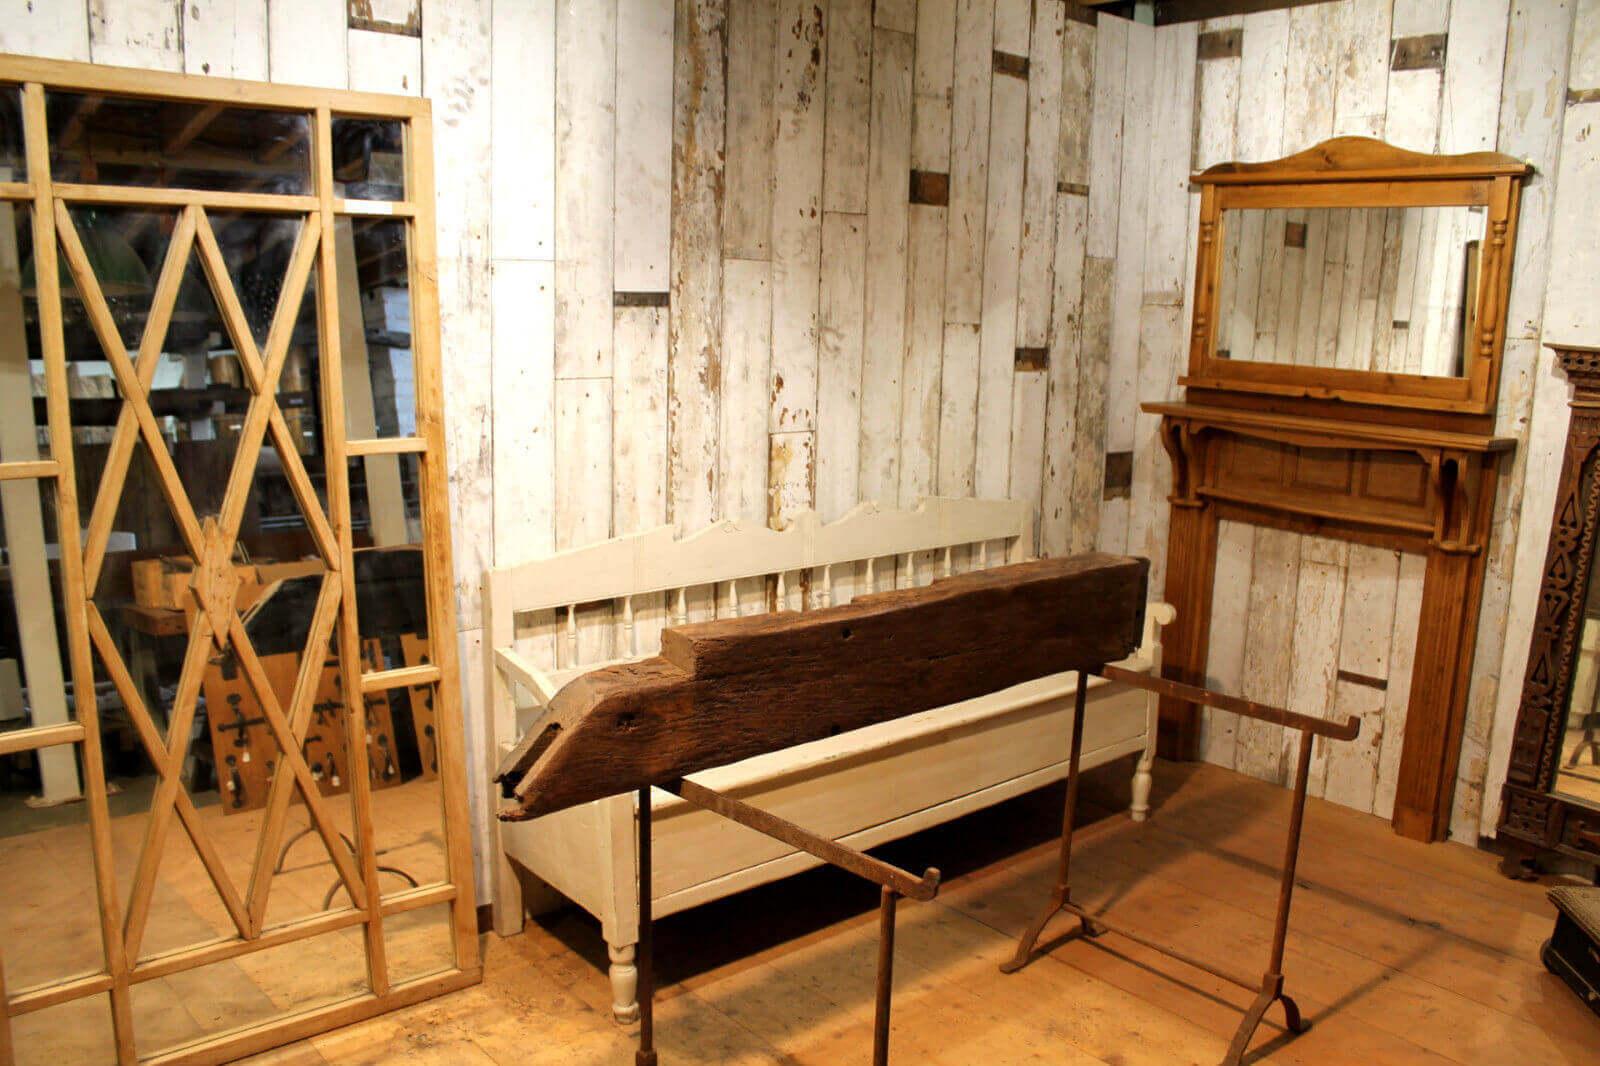 Ob014 Reclaimed English Oak Beam Inglenook Fireplace